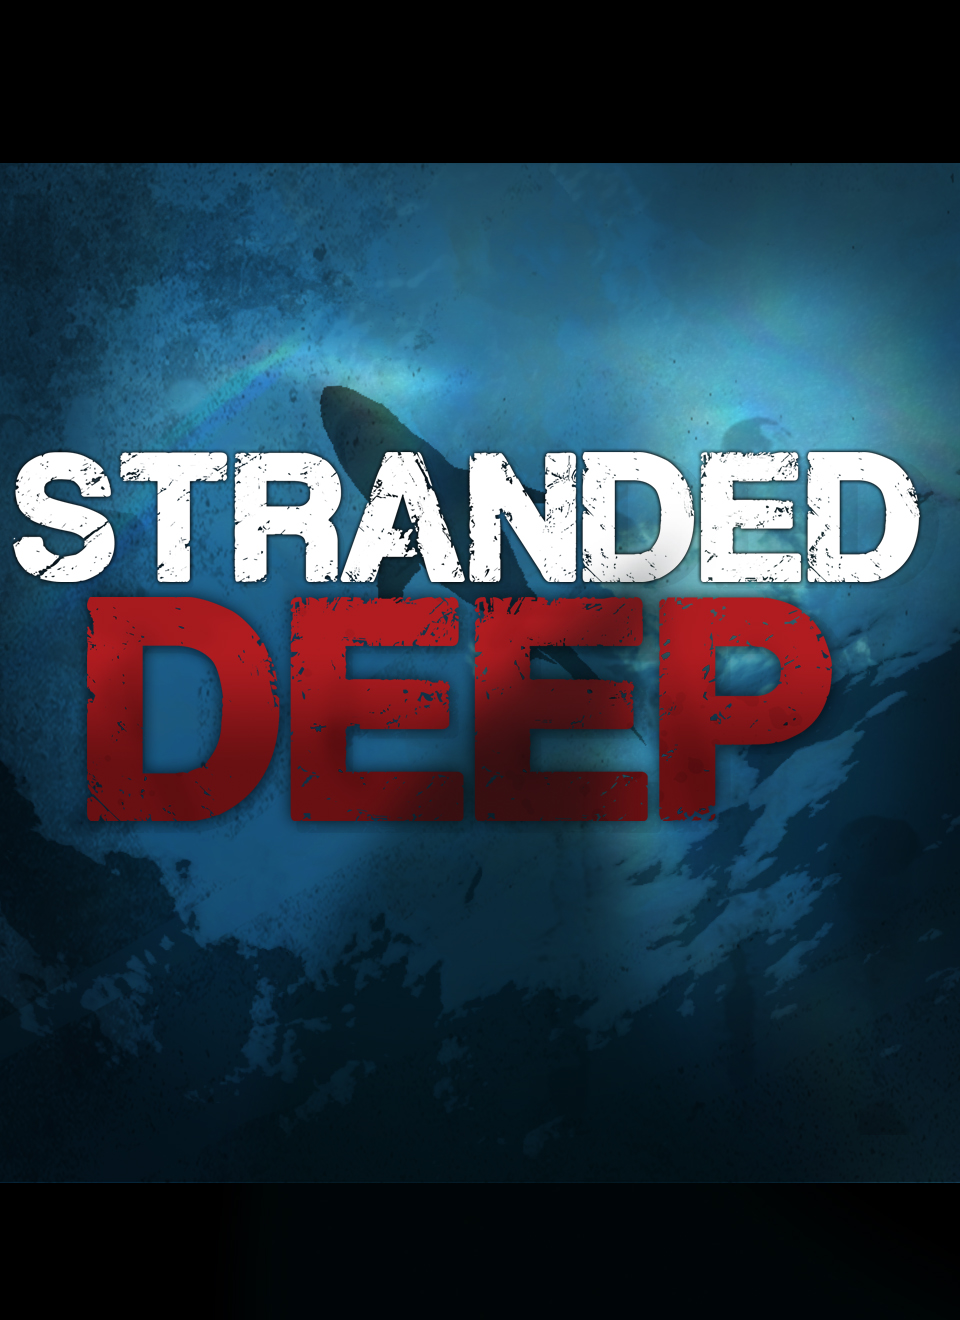 Stranded Deep World Map.Stranded Deep Windows Mac Linux Vr Game Indie Db